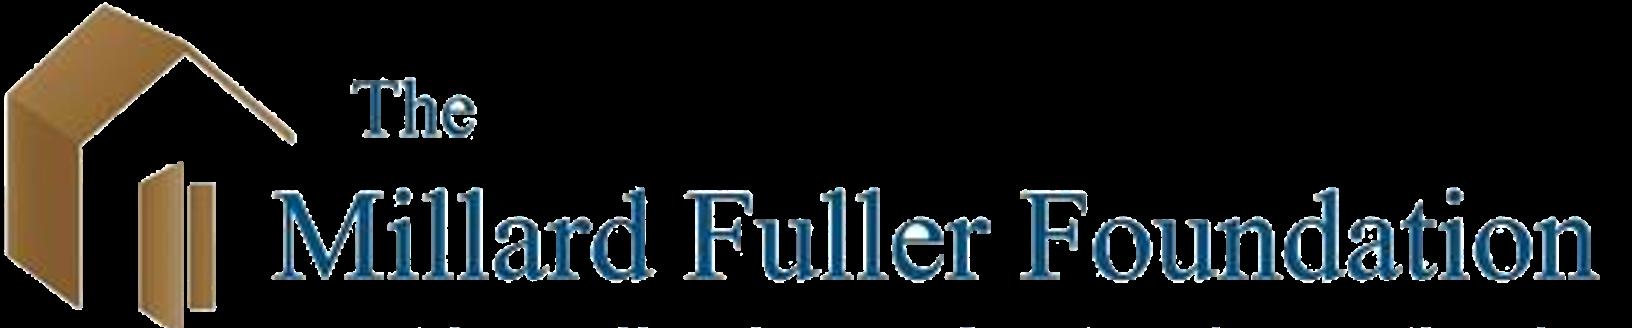 The Millard Fuller Foundation